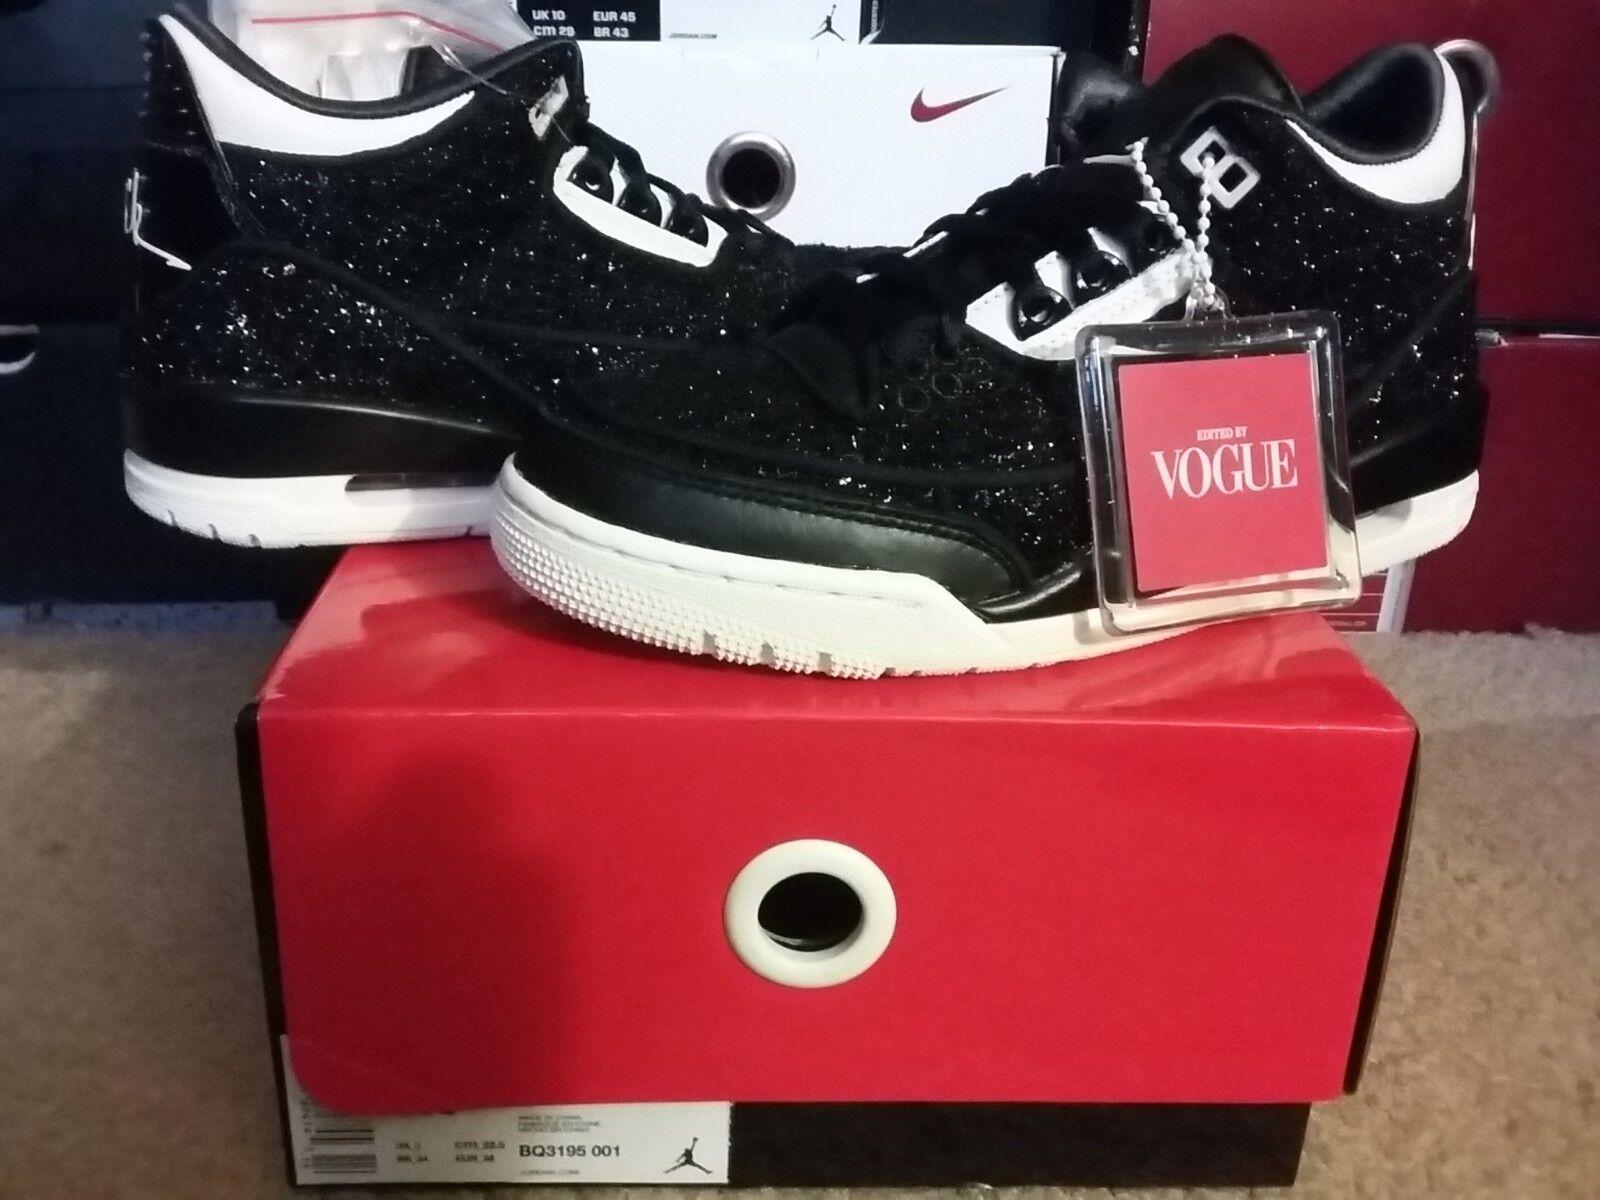 cooperar Tahití traducir  Womens Nike Air Jordan III 3 Retro SE AWOK NRG Vogue Anna Wintour v x  BQ3195 001 for sale online